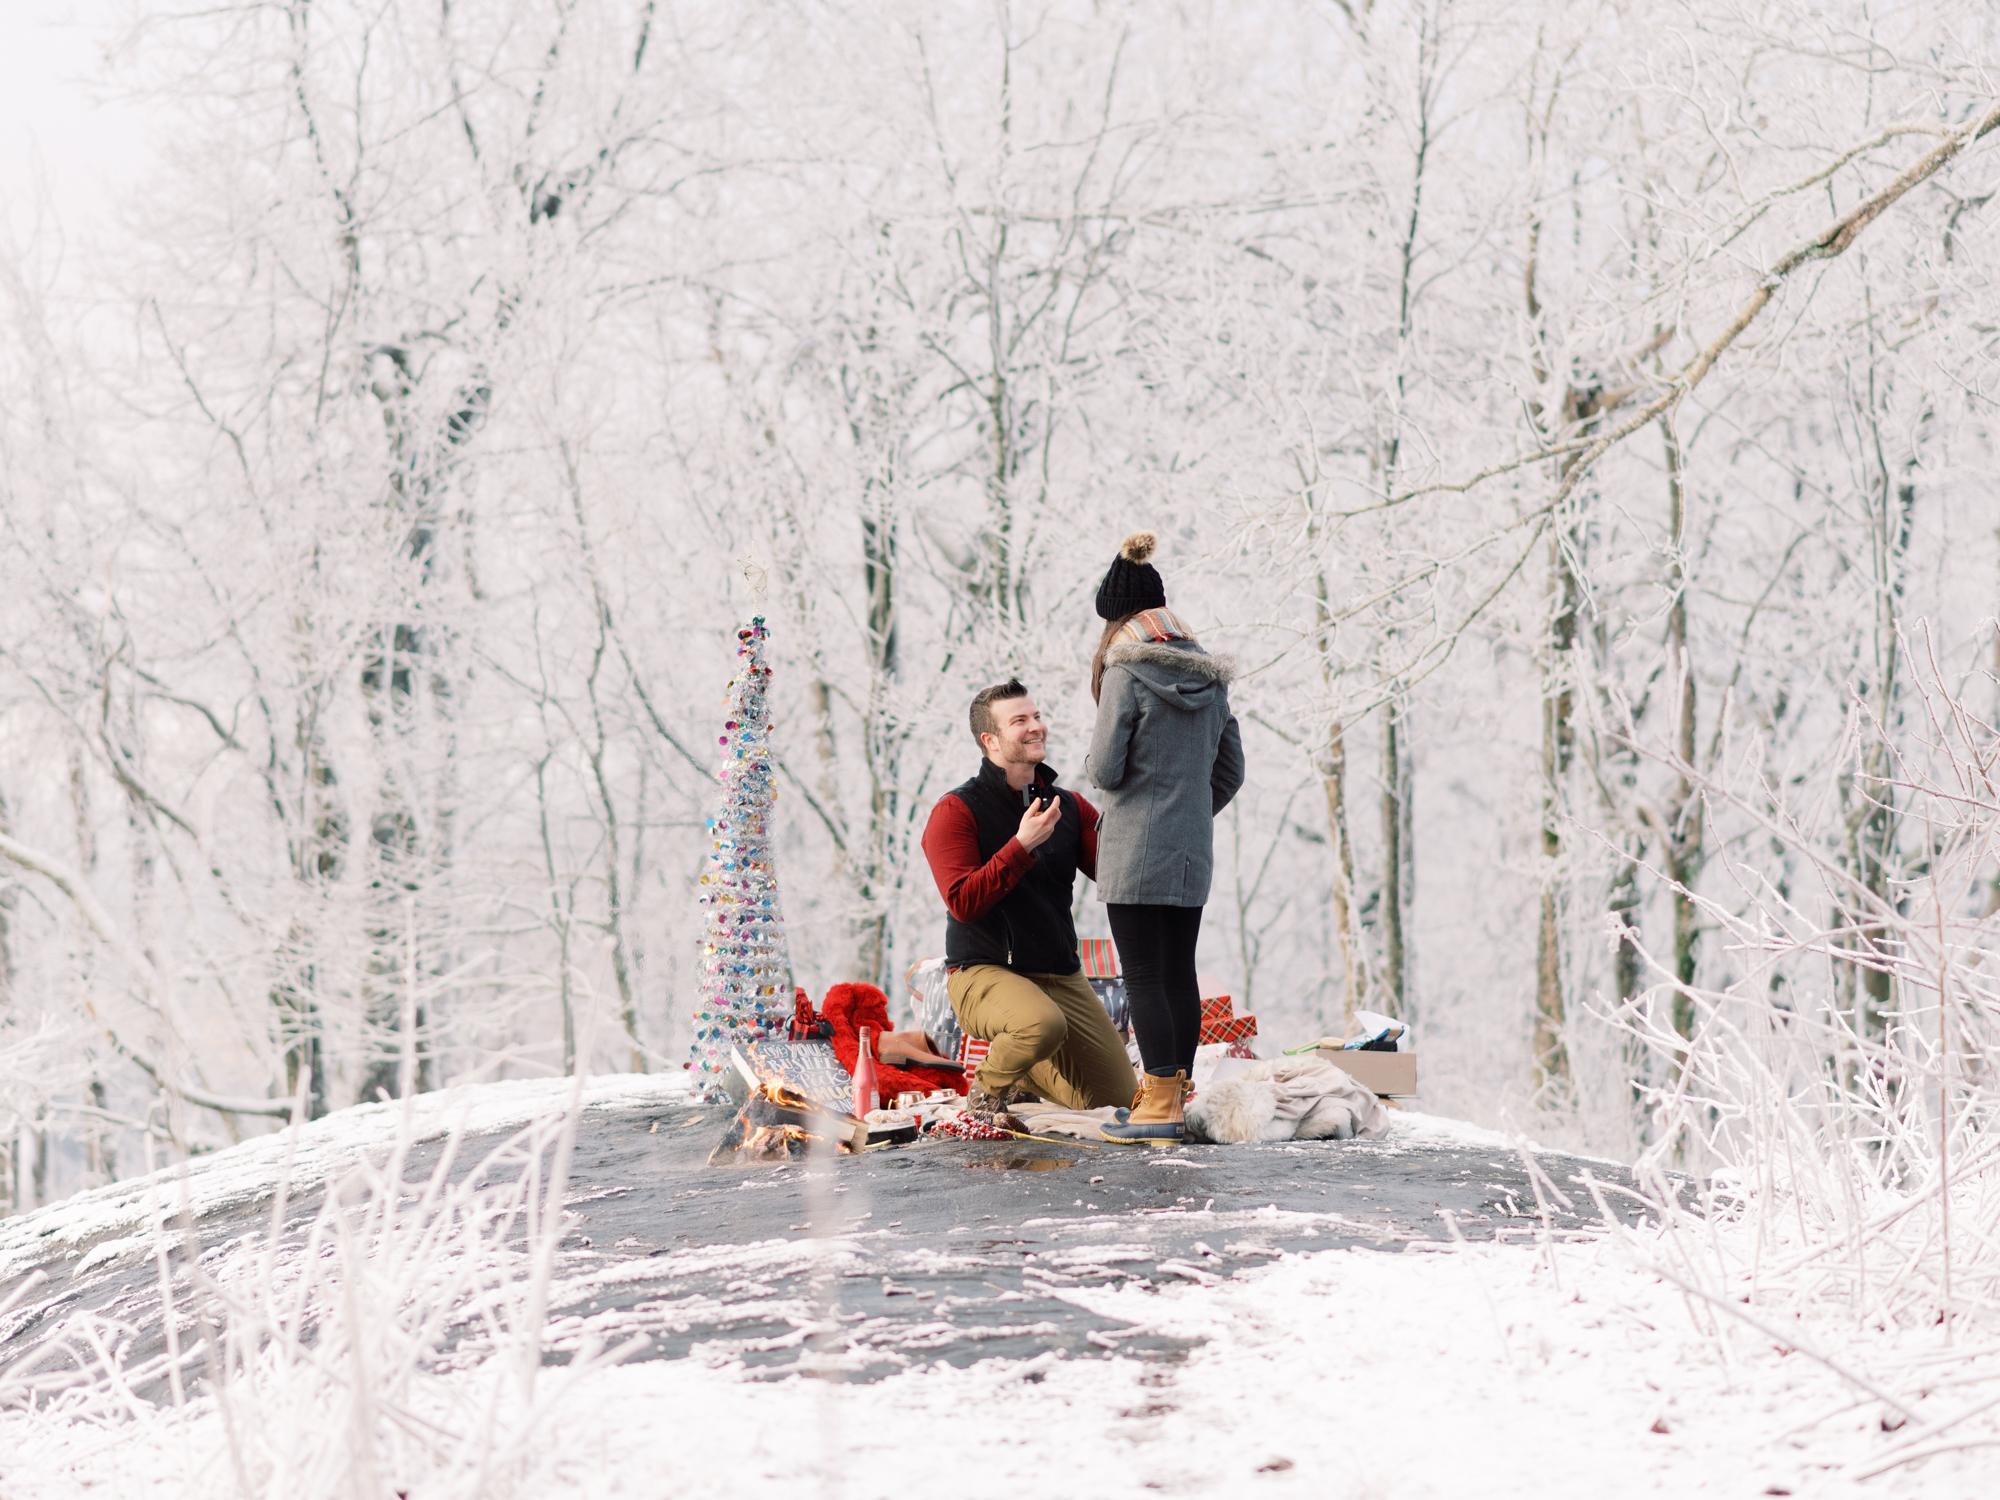 snowy-georgia-proposal-preachers-rock-atlanta-dahlonega-wedding-photographer-hannah-forsberg-fine-art-film-8.jpg